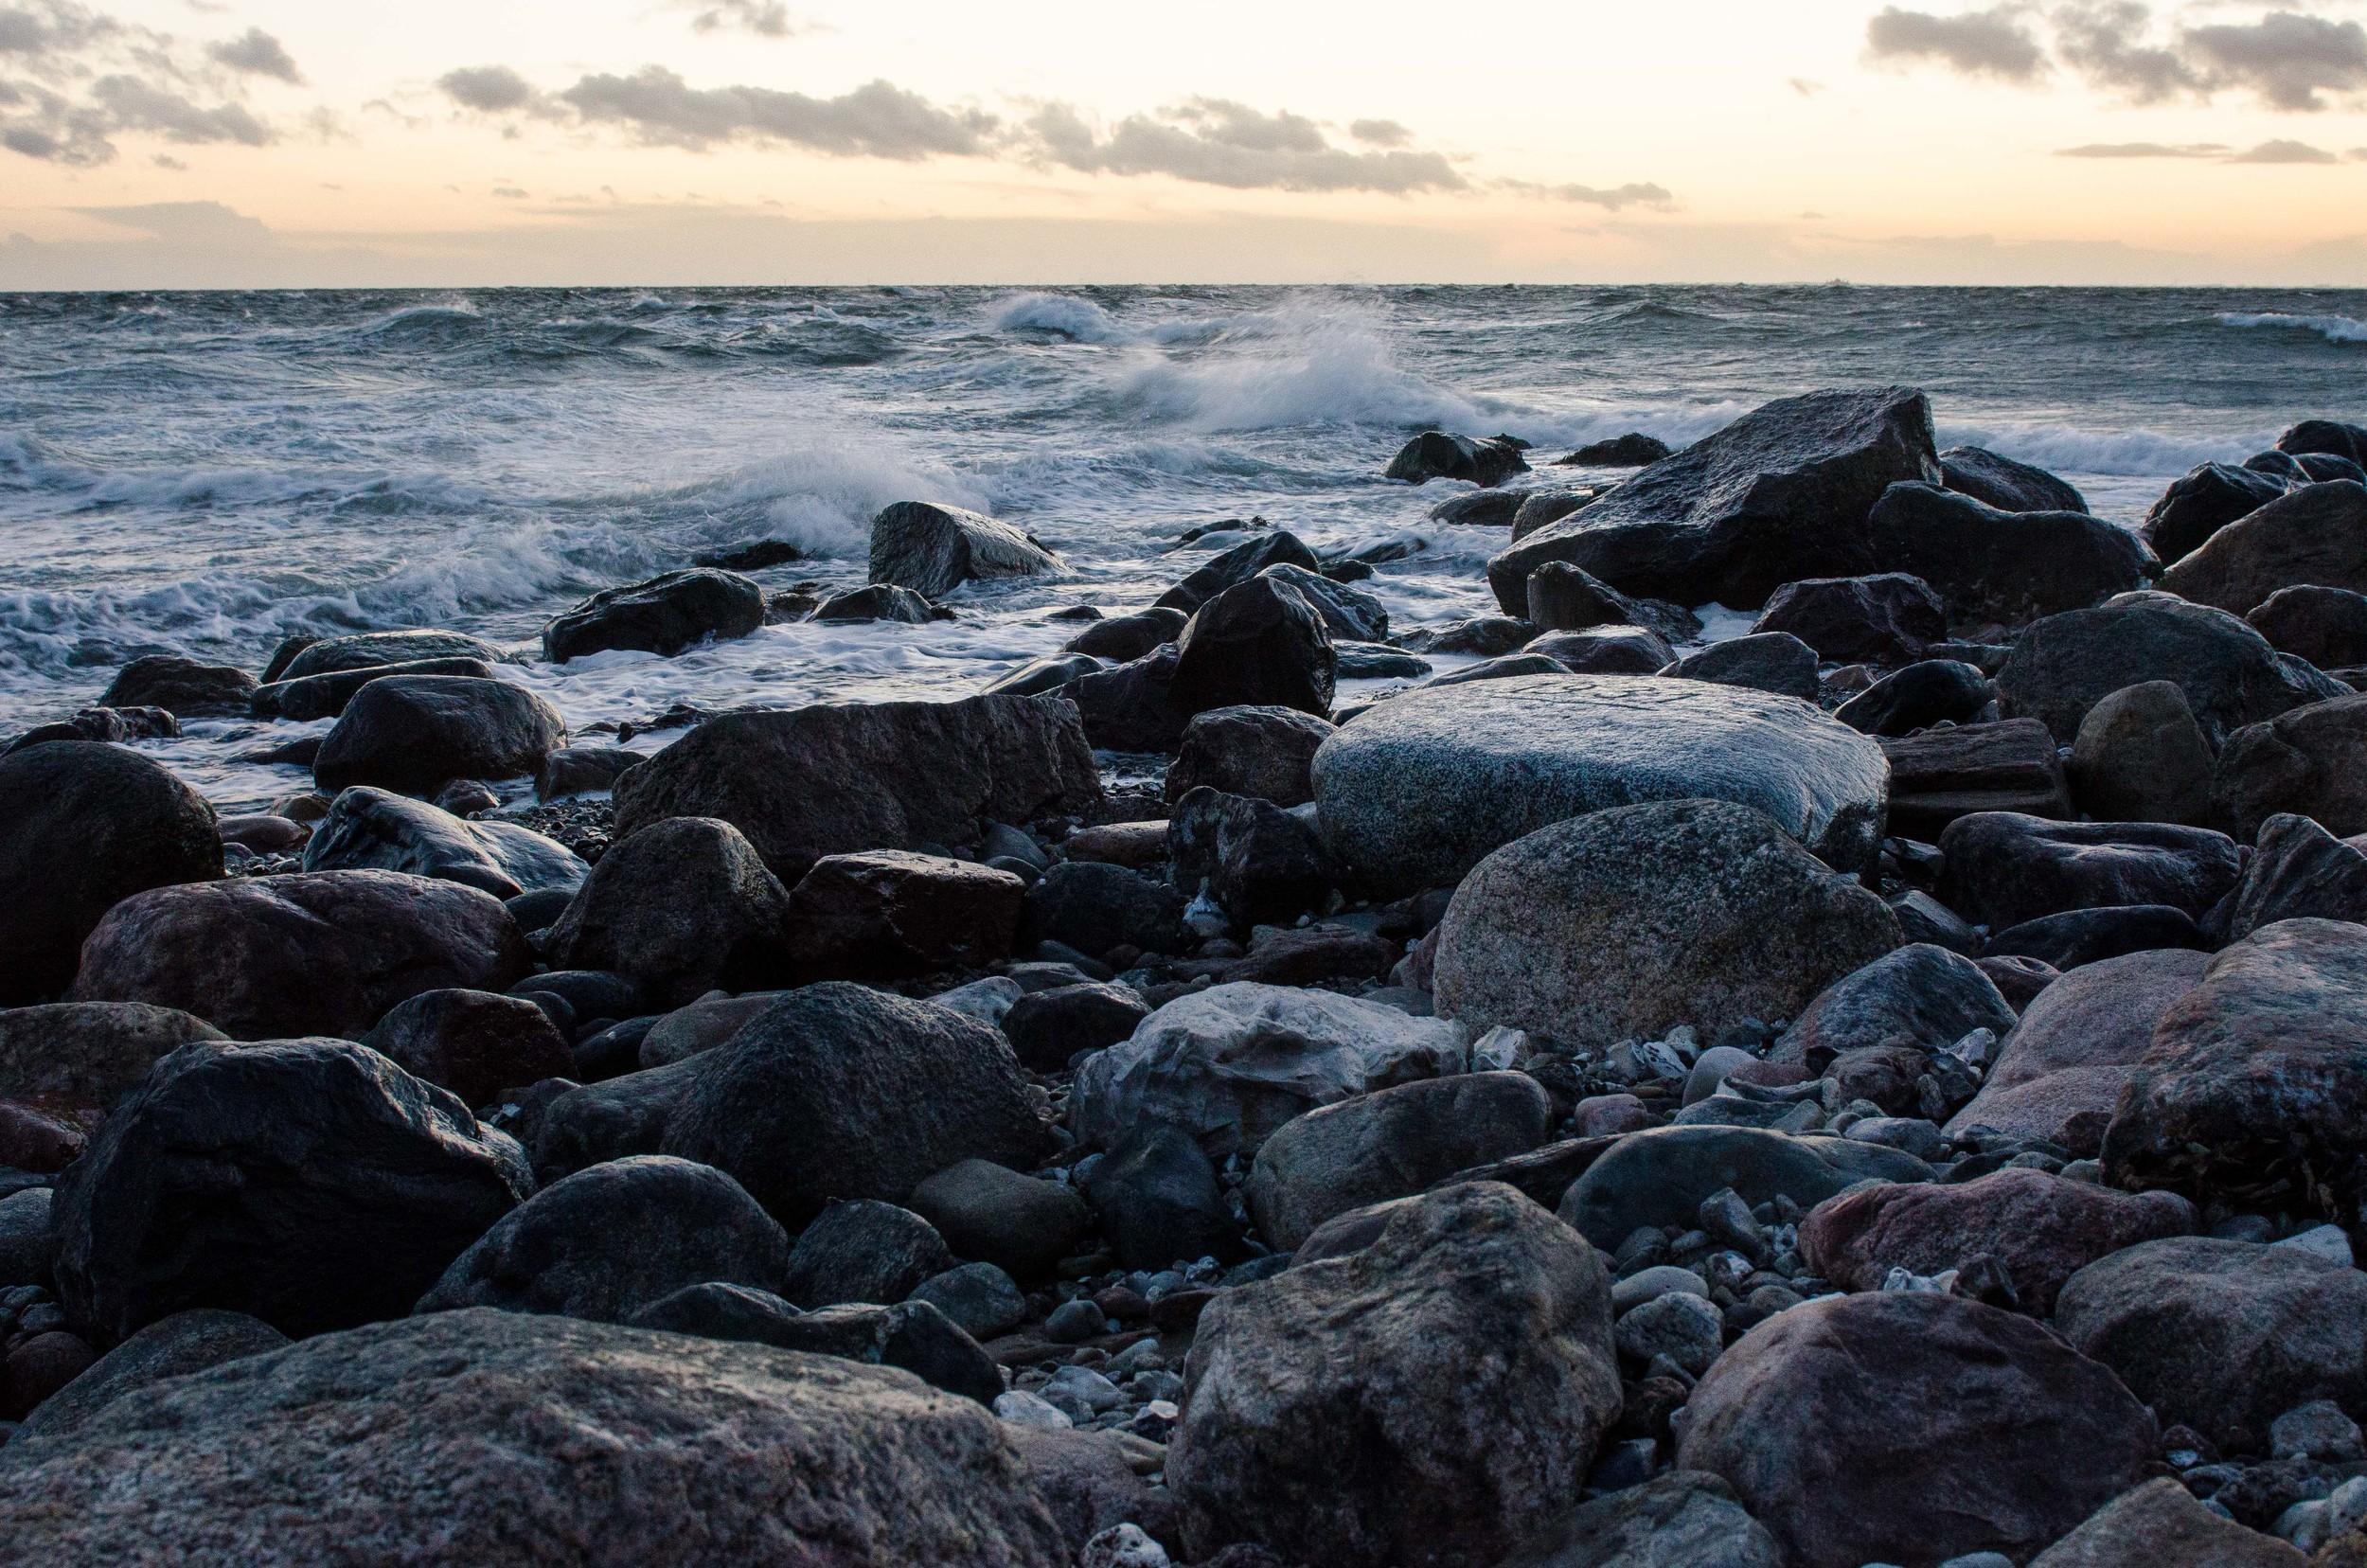 Adventure_photographer_ocean_sea_walk_sunset-4.jpg